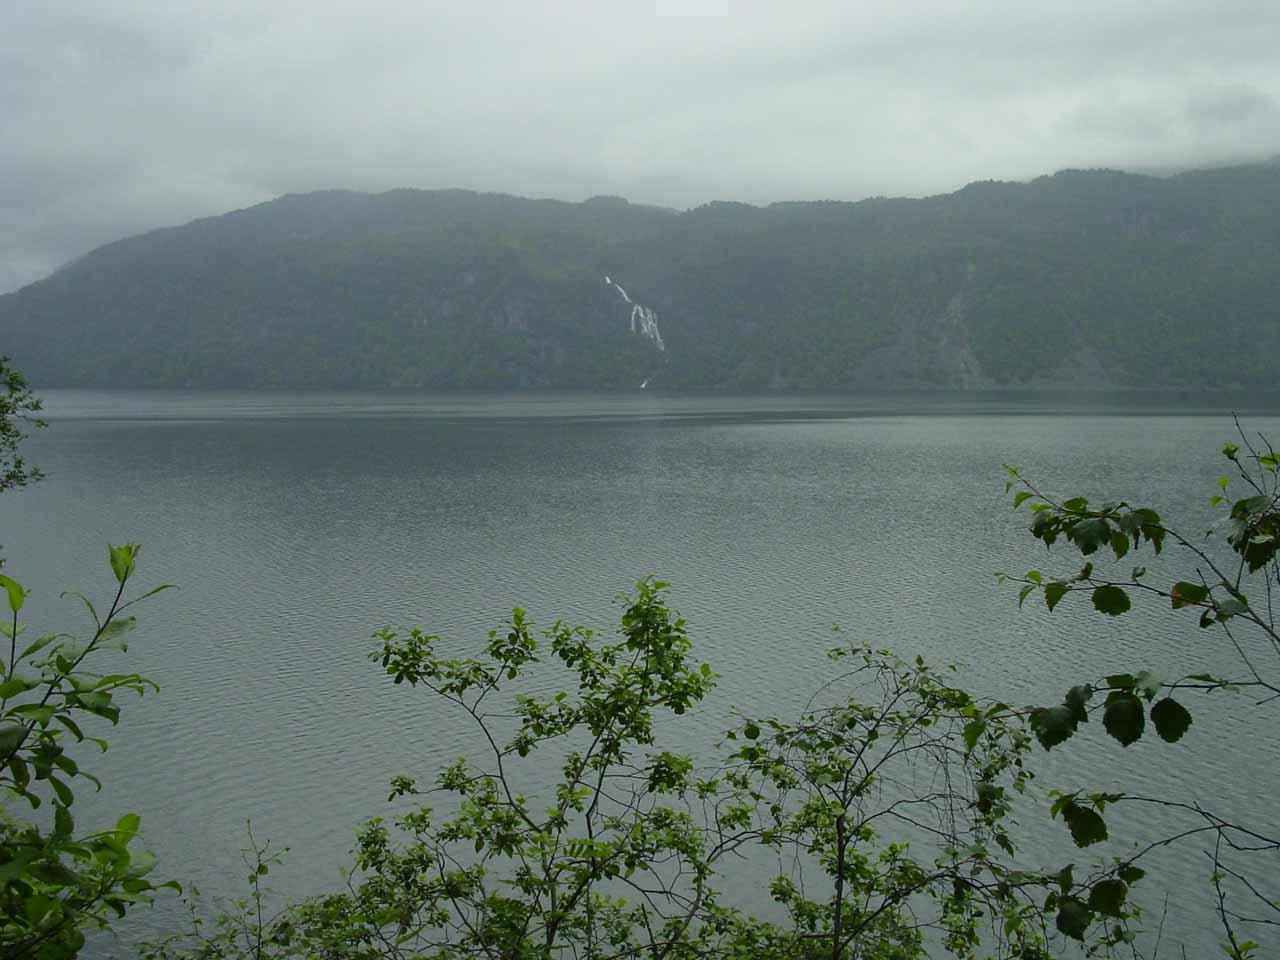 Contextual view looking across Saudafjorden towards what I think is Maldalsfossen